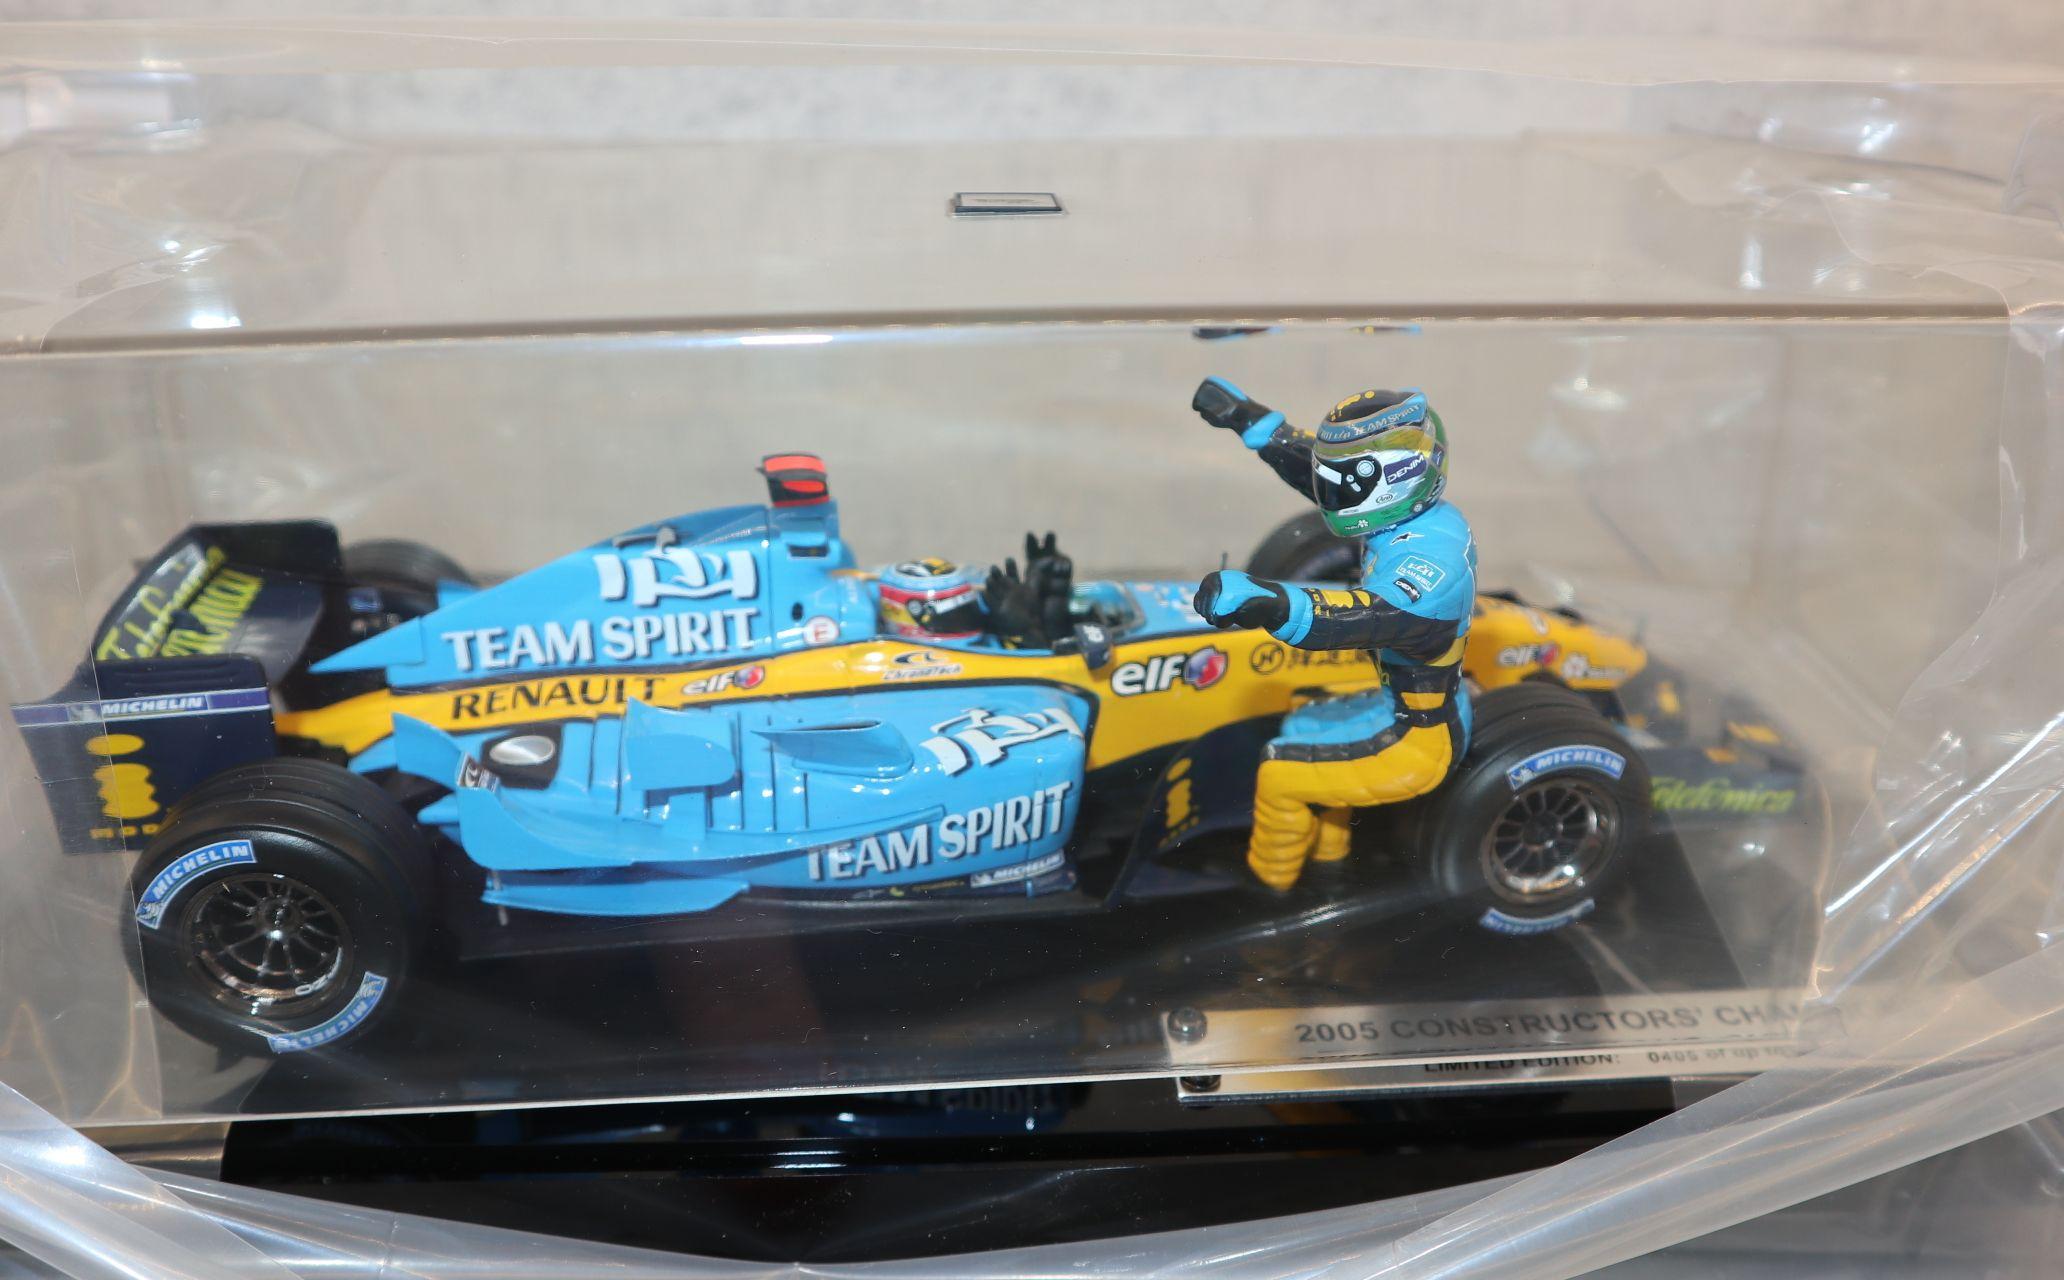 Hot Wheels G9754 1:18 Shanghai Intl Circuit 16.10.05, Shanghai WM Renault Edition OVP